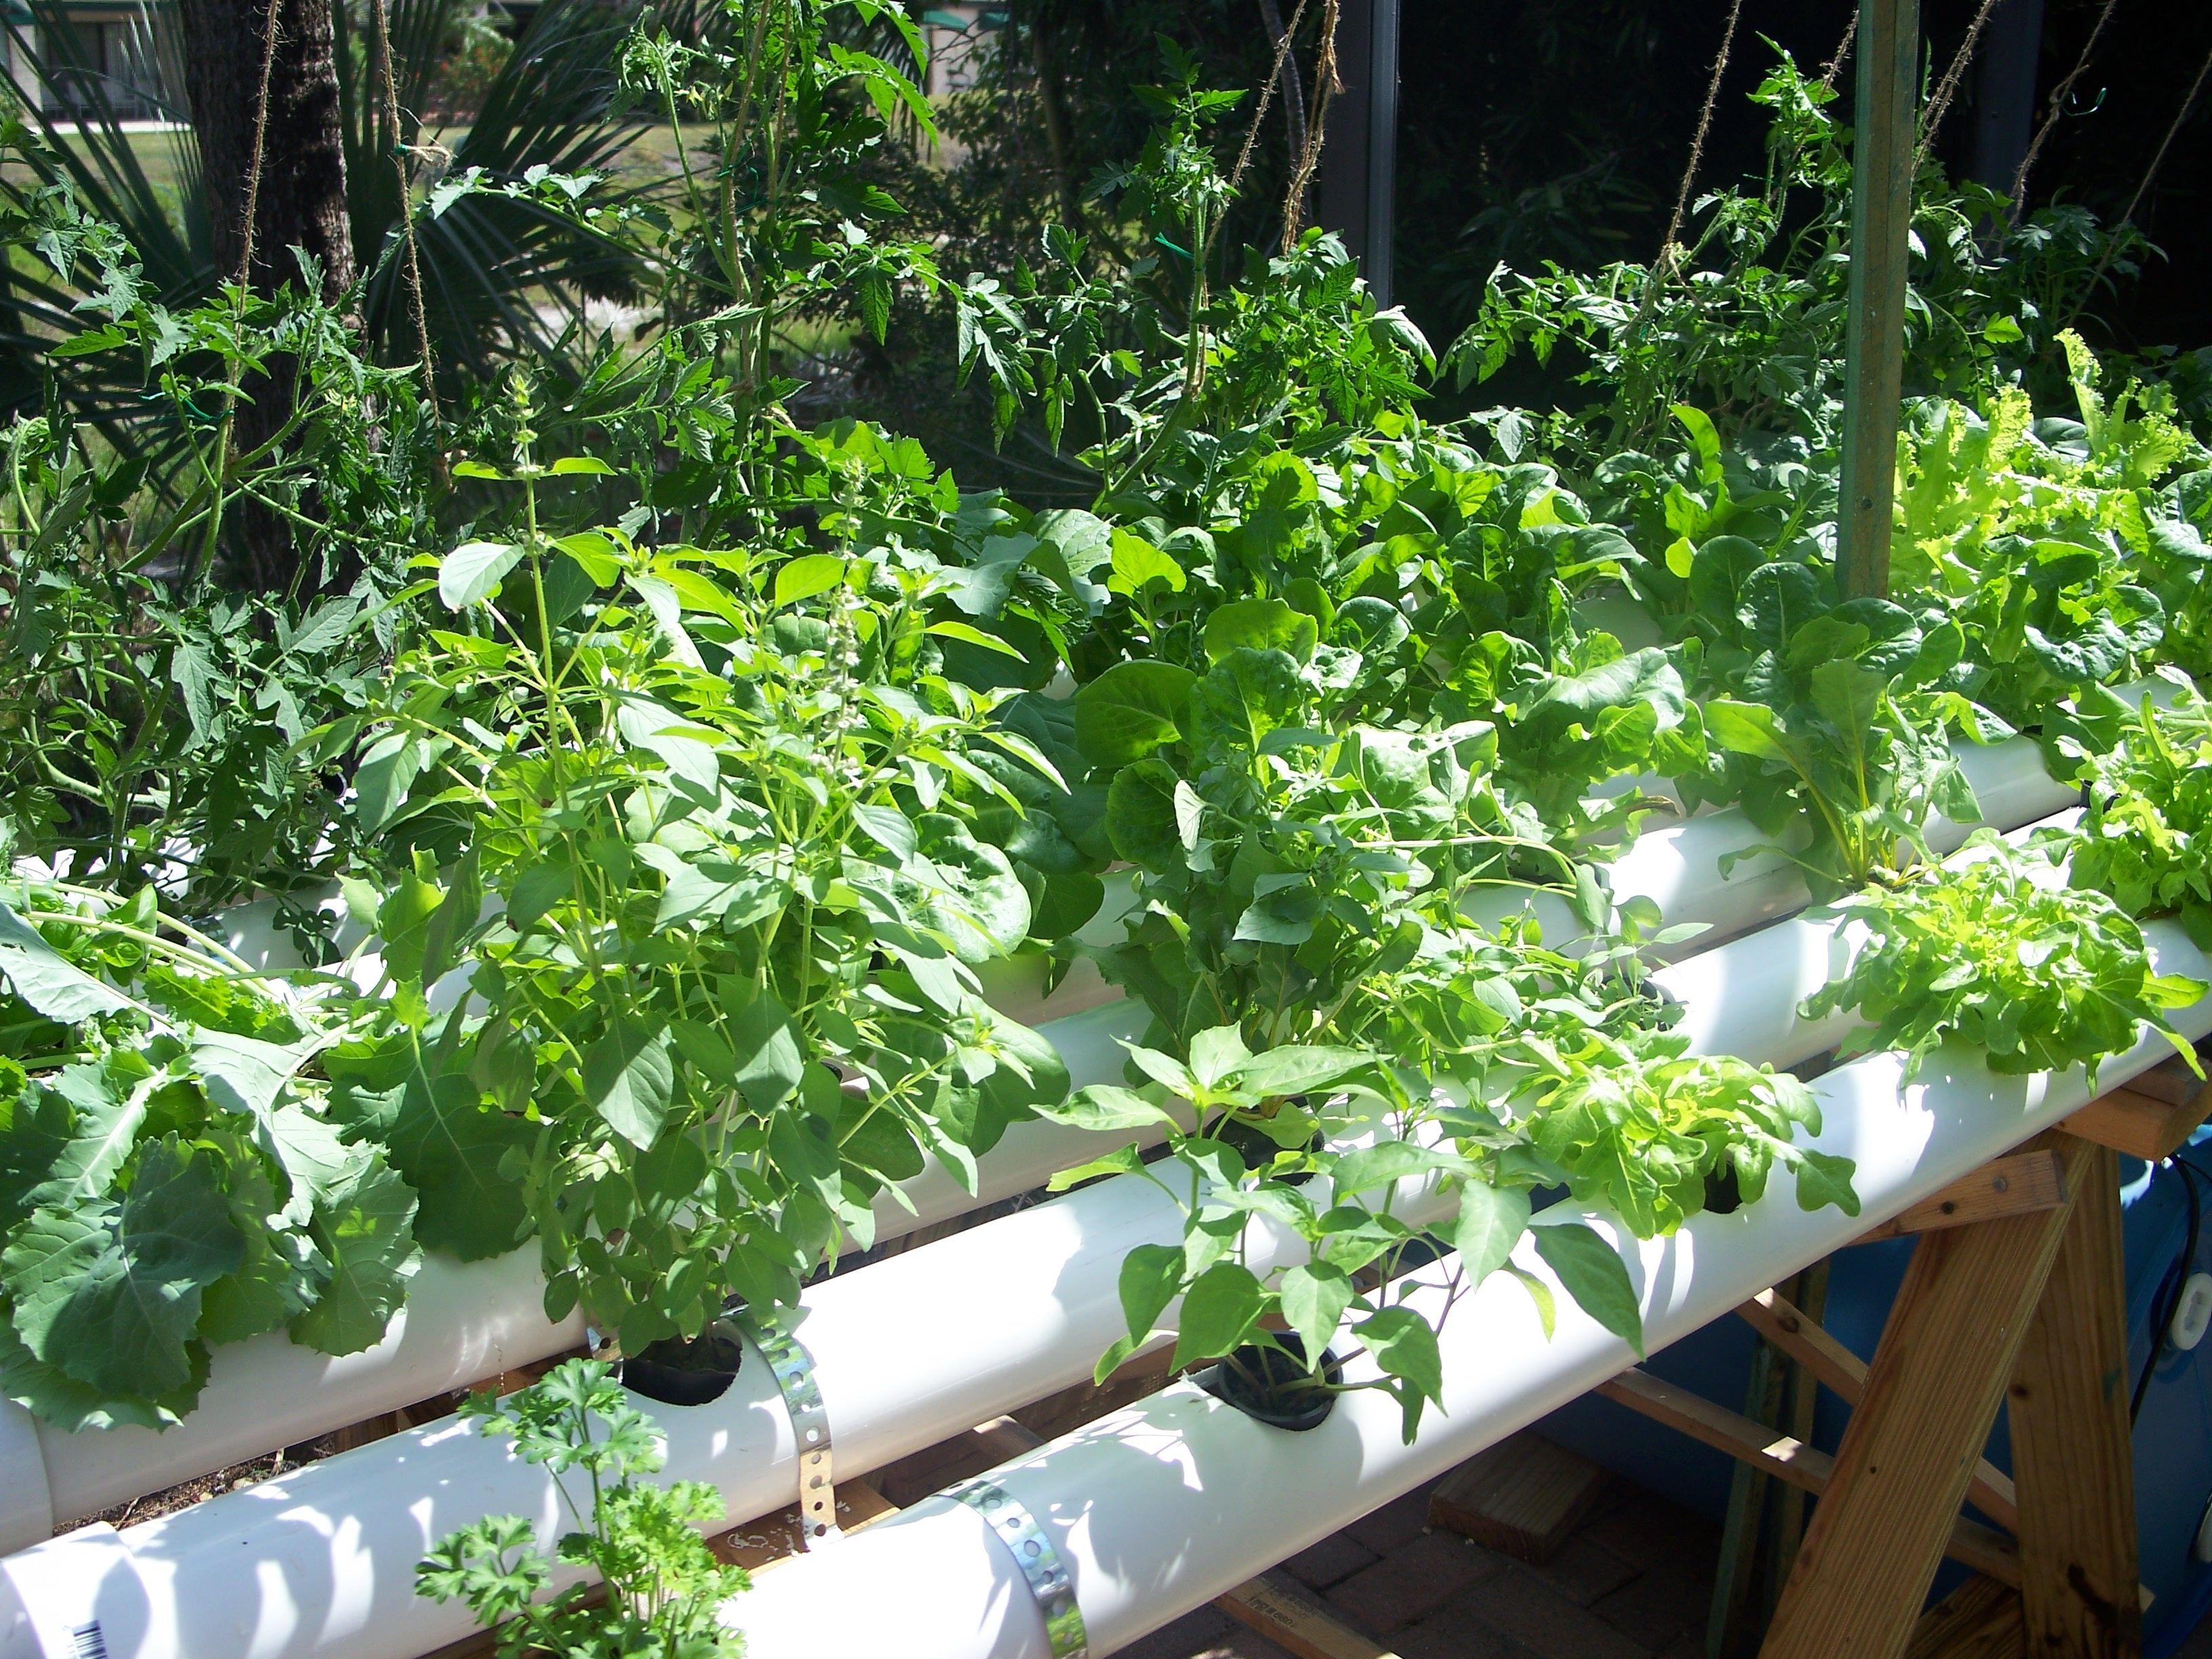 Http://www.hydroponics Simplified.com/hydroponic Growing Medium.html |  Organza Garden | Pinterest | Hydroponics, Hydroponic Growing And Hydroponic  Gardening